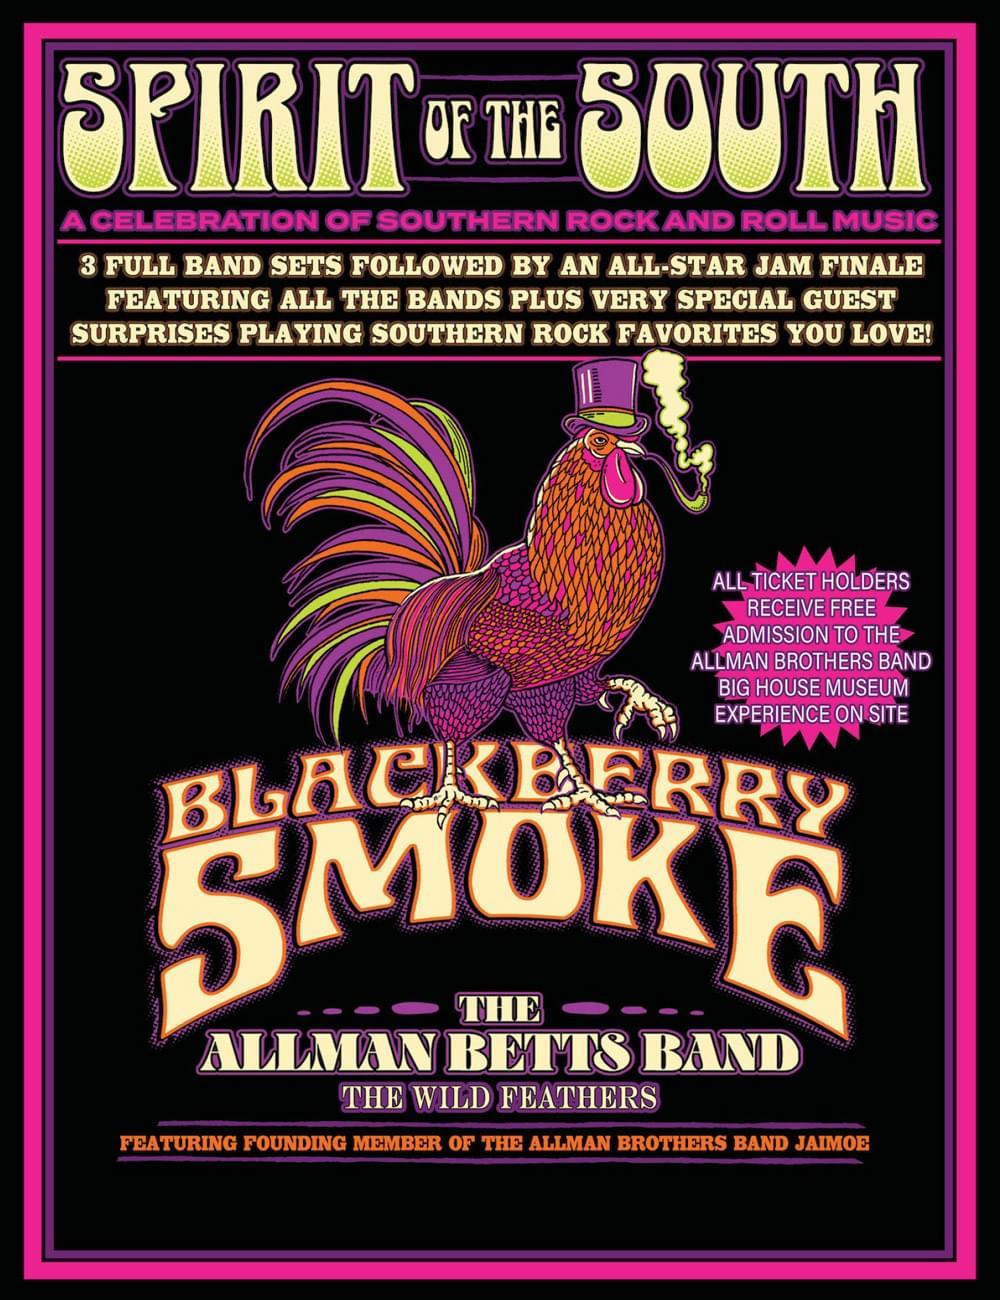 Blackberry Smoke & The Allman Betts Band